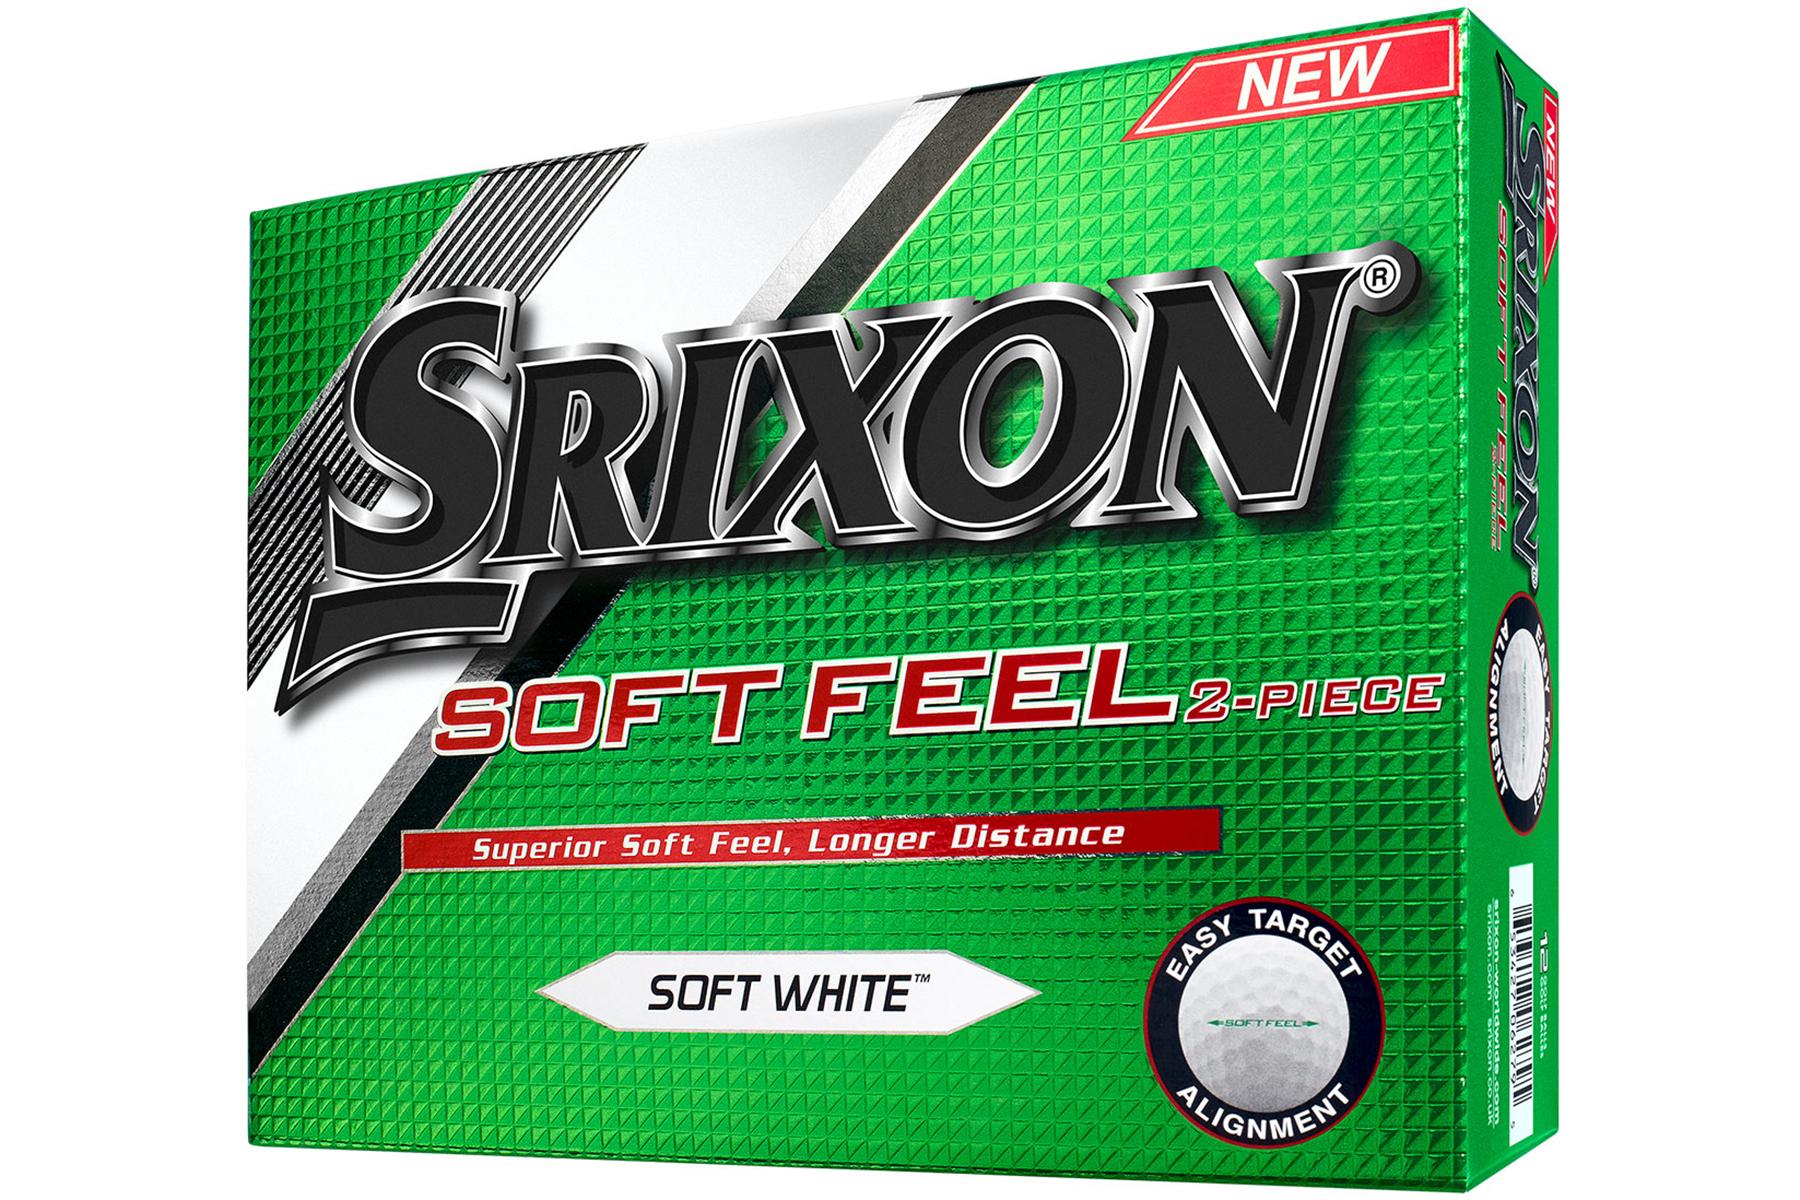 Image result for srixon soft feel